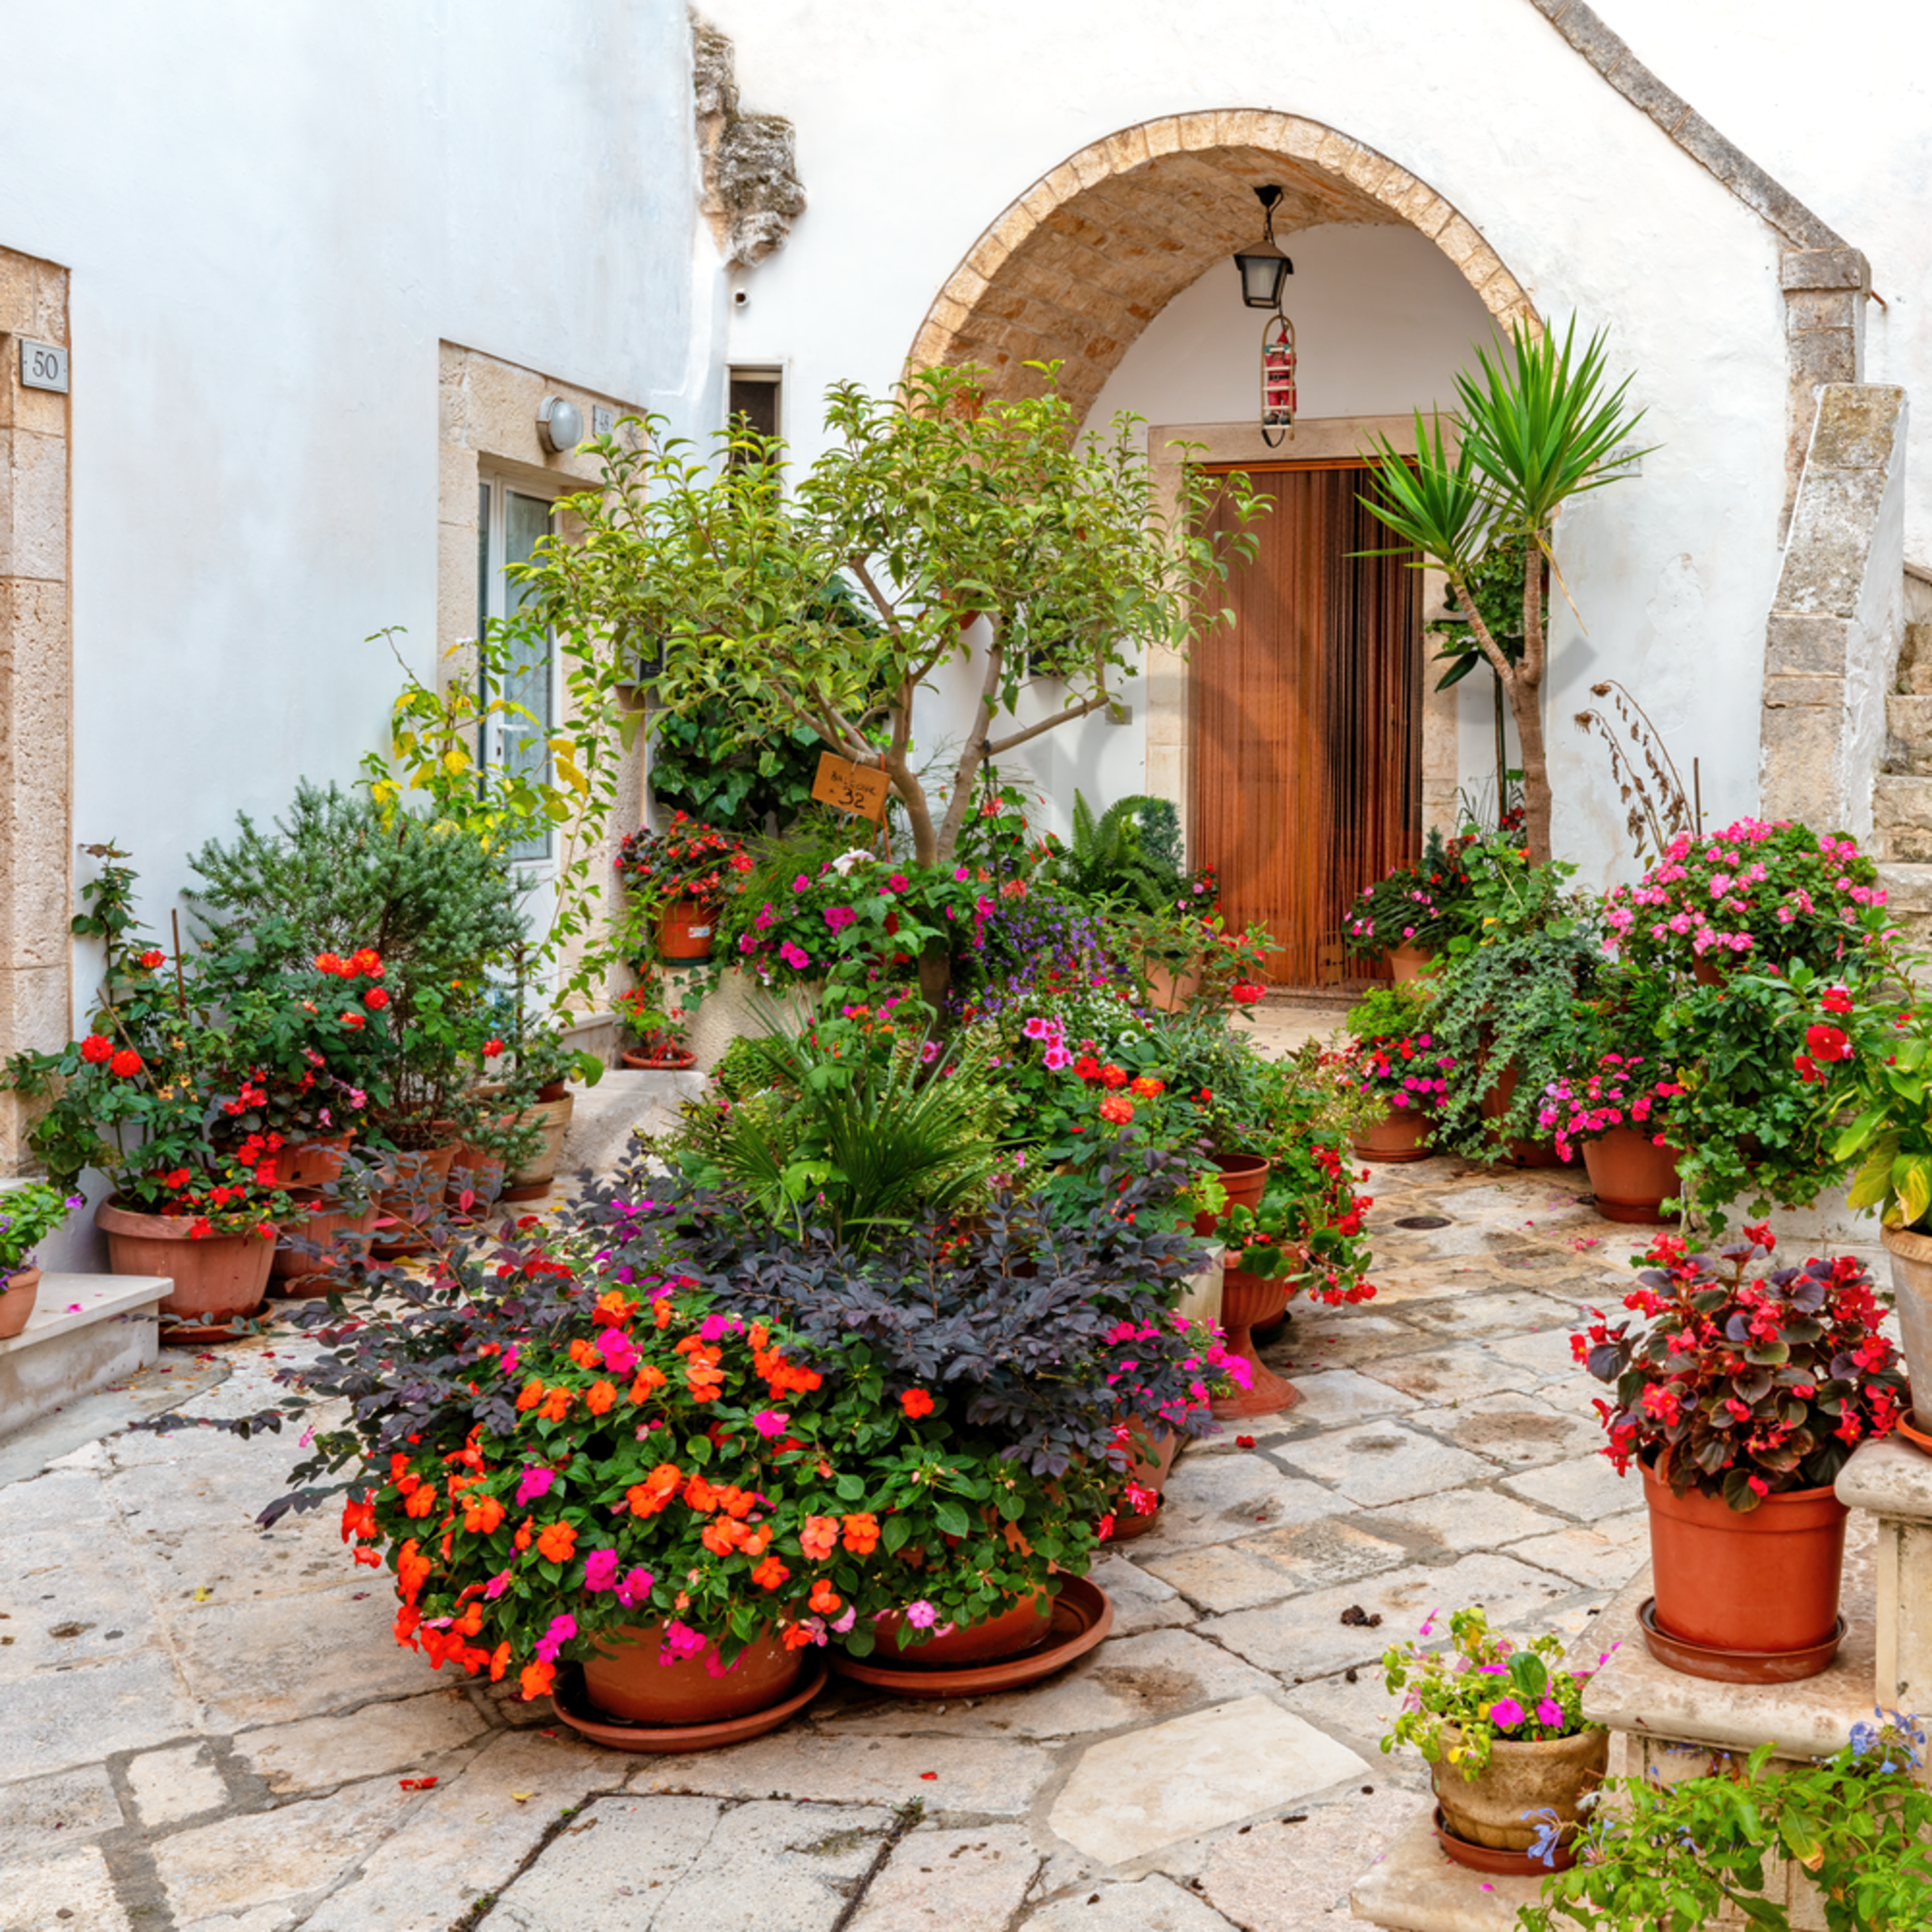 Courtyard with flowers locorotondo puglia italy ii jwaumq